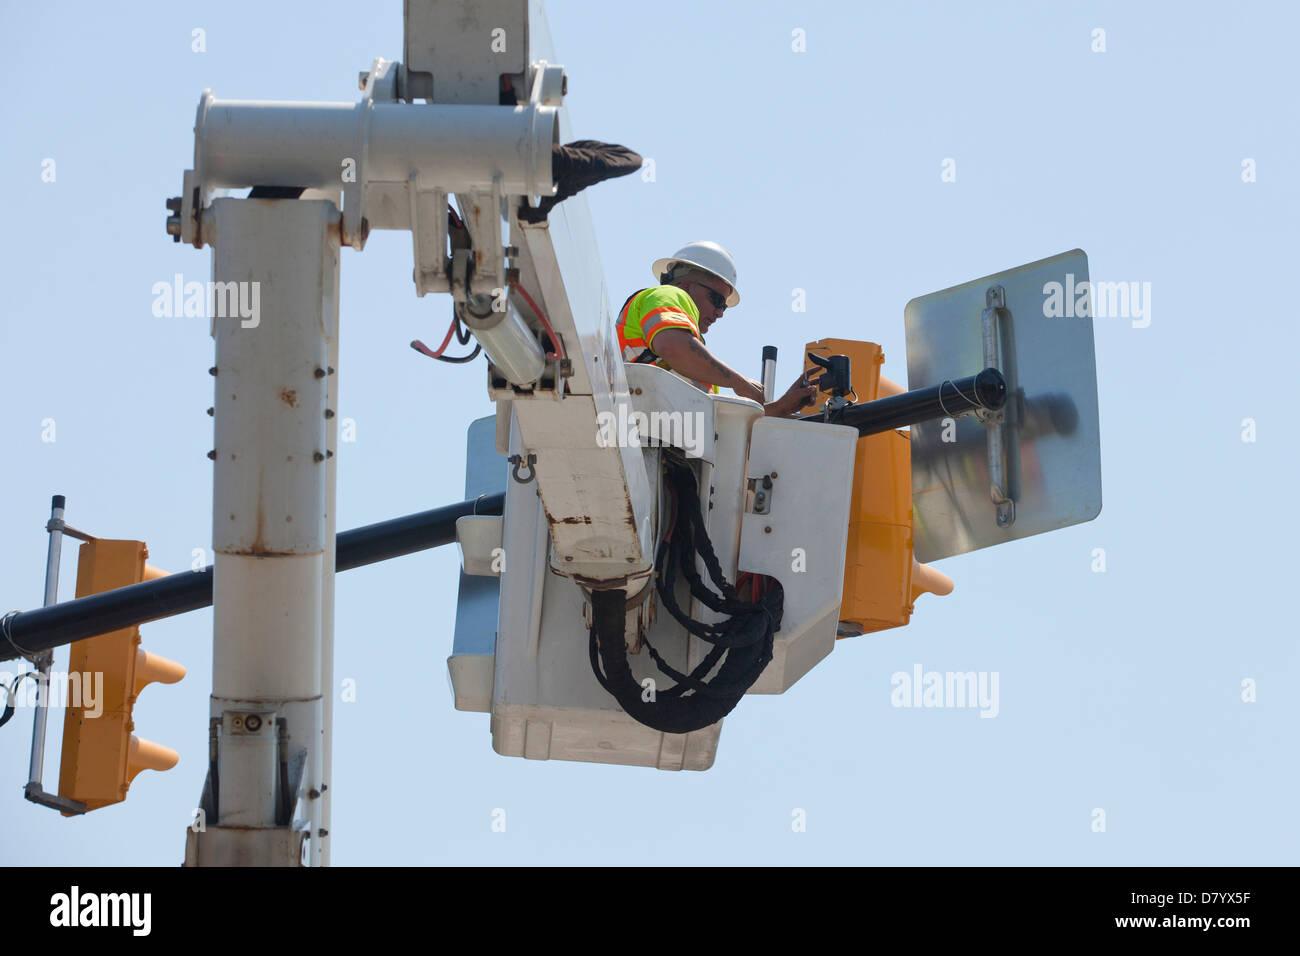 Workman installing new traffic lights - Stock Image